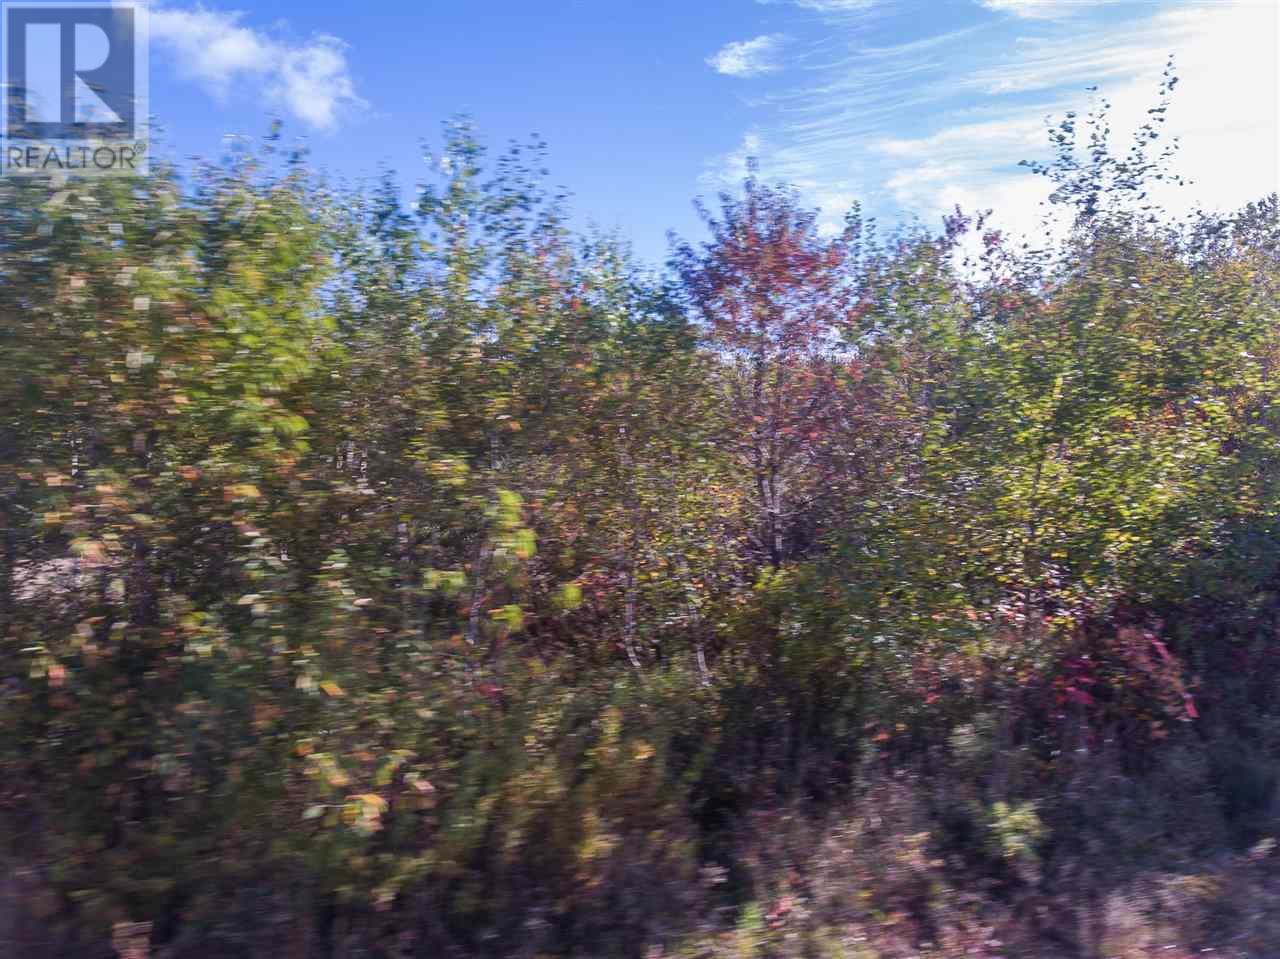 Lot 2a Bonavista Drive, Nictaux, Nova Scotia  B0S 1P0 - Photo 5 - 201824230